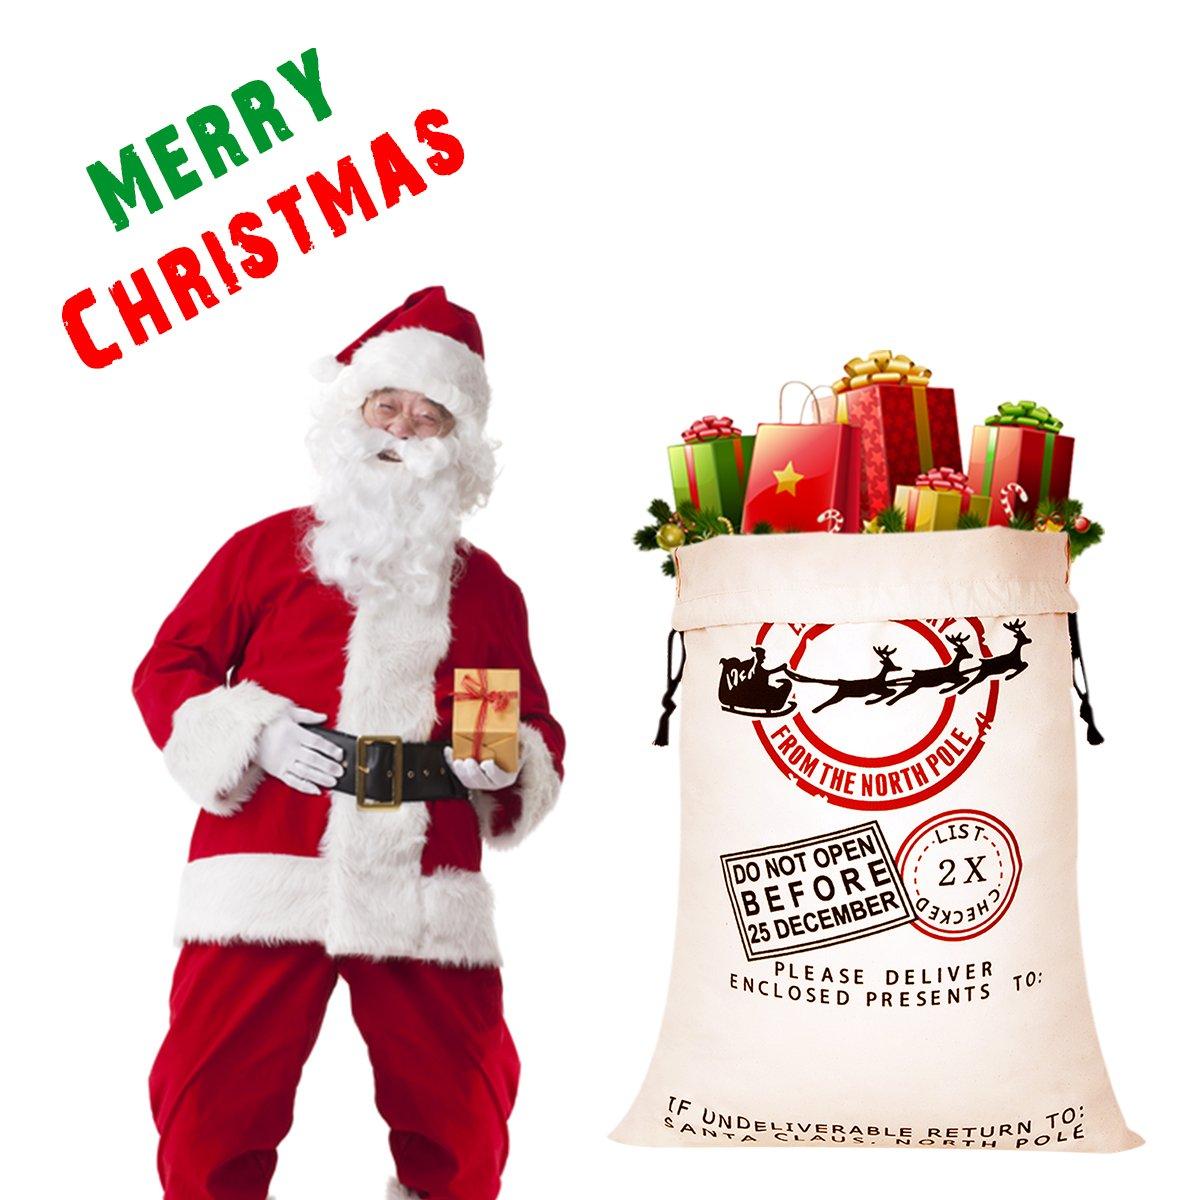 Amazon.com: Personalized Santa Sack, HBlife Christmas Gift Bag Santa ...